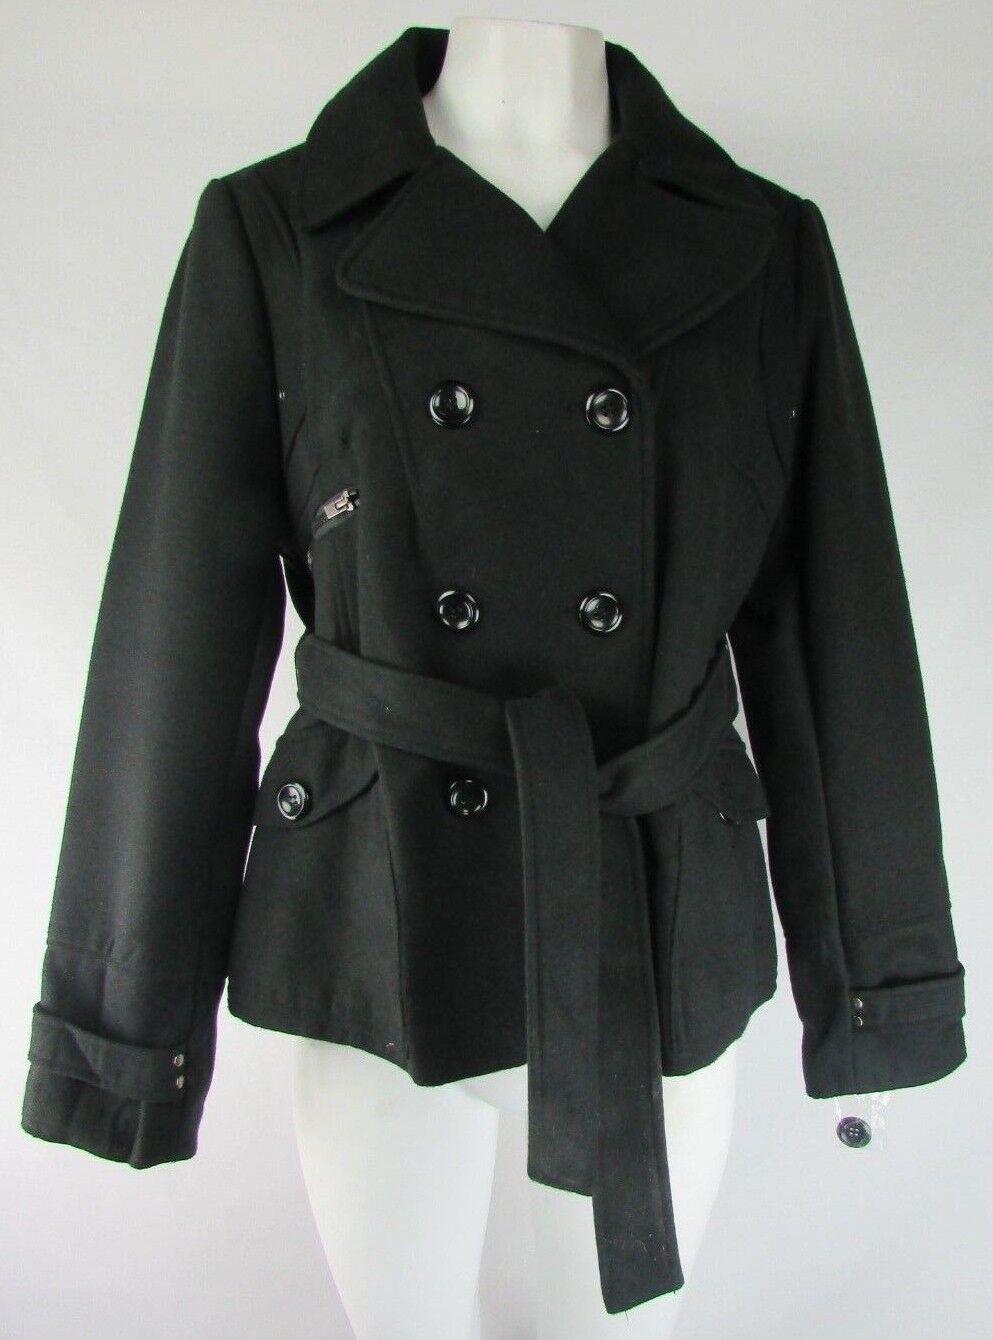 Maralyn /& Me Junior Ladies Double Breasted Waist High Pea Coat with Hood